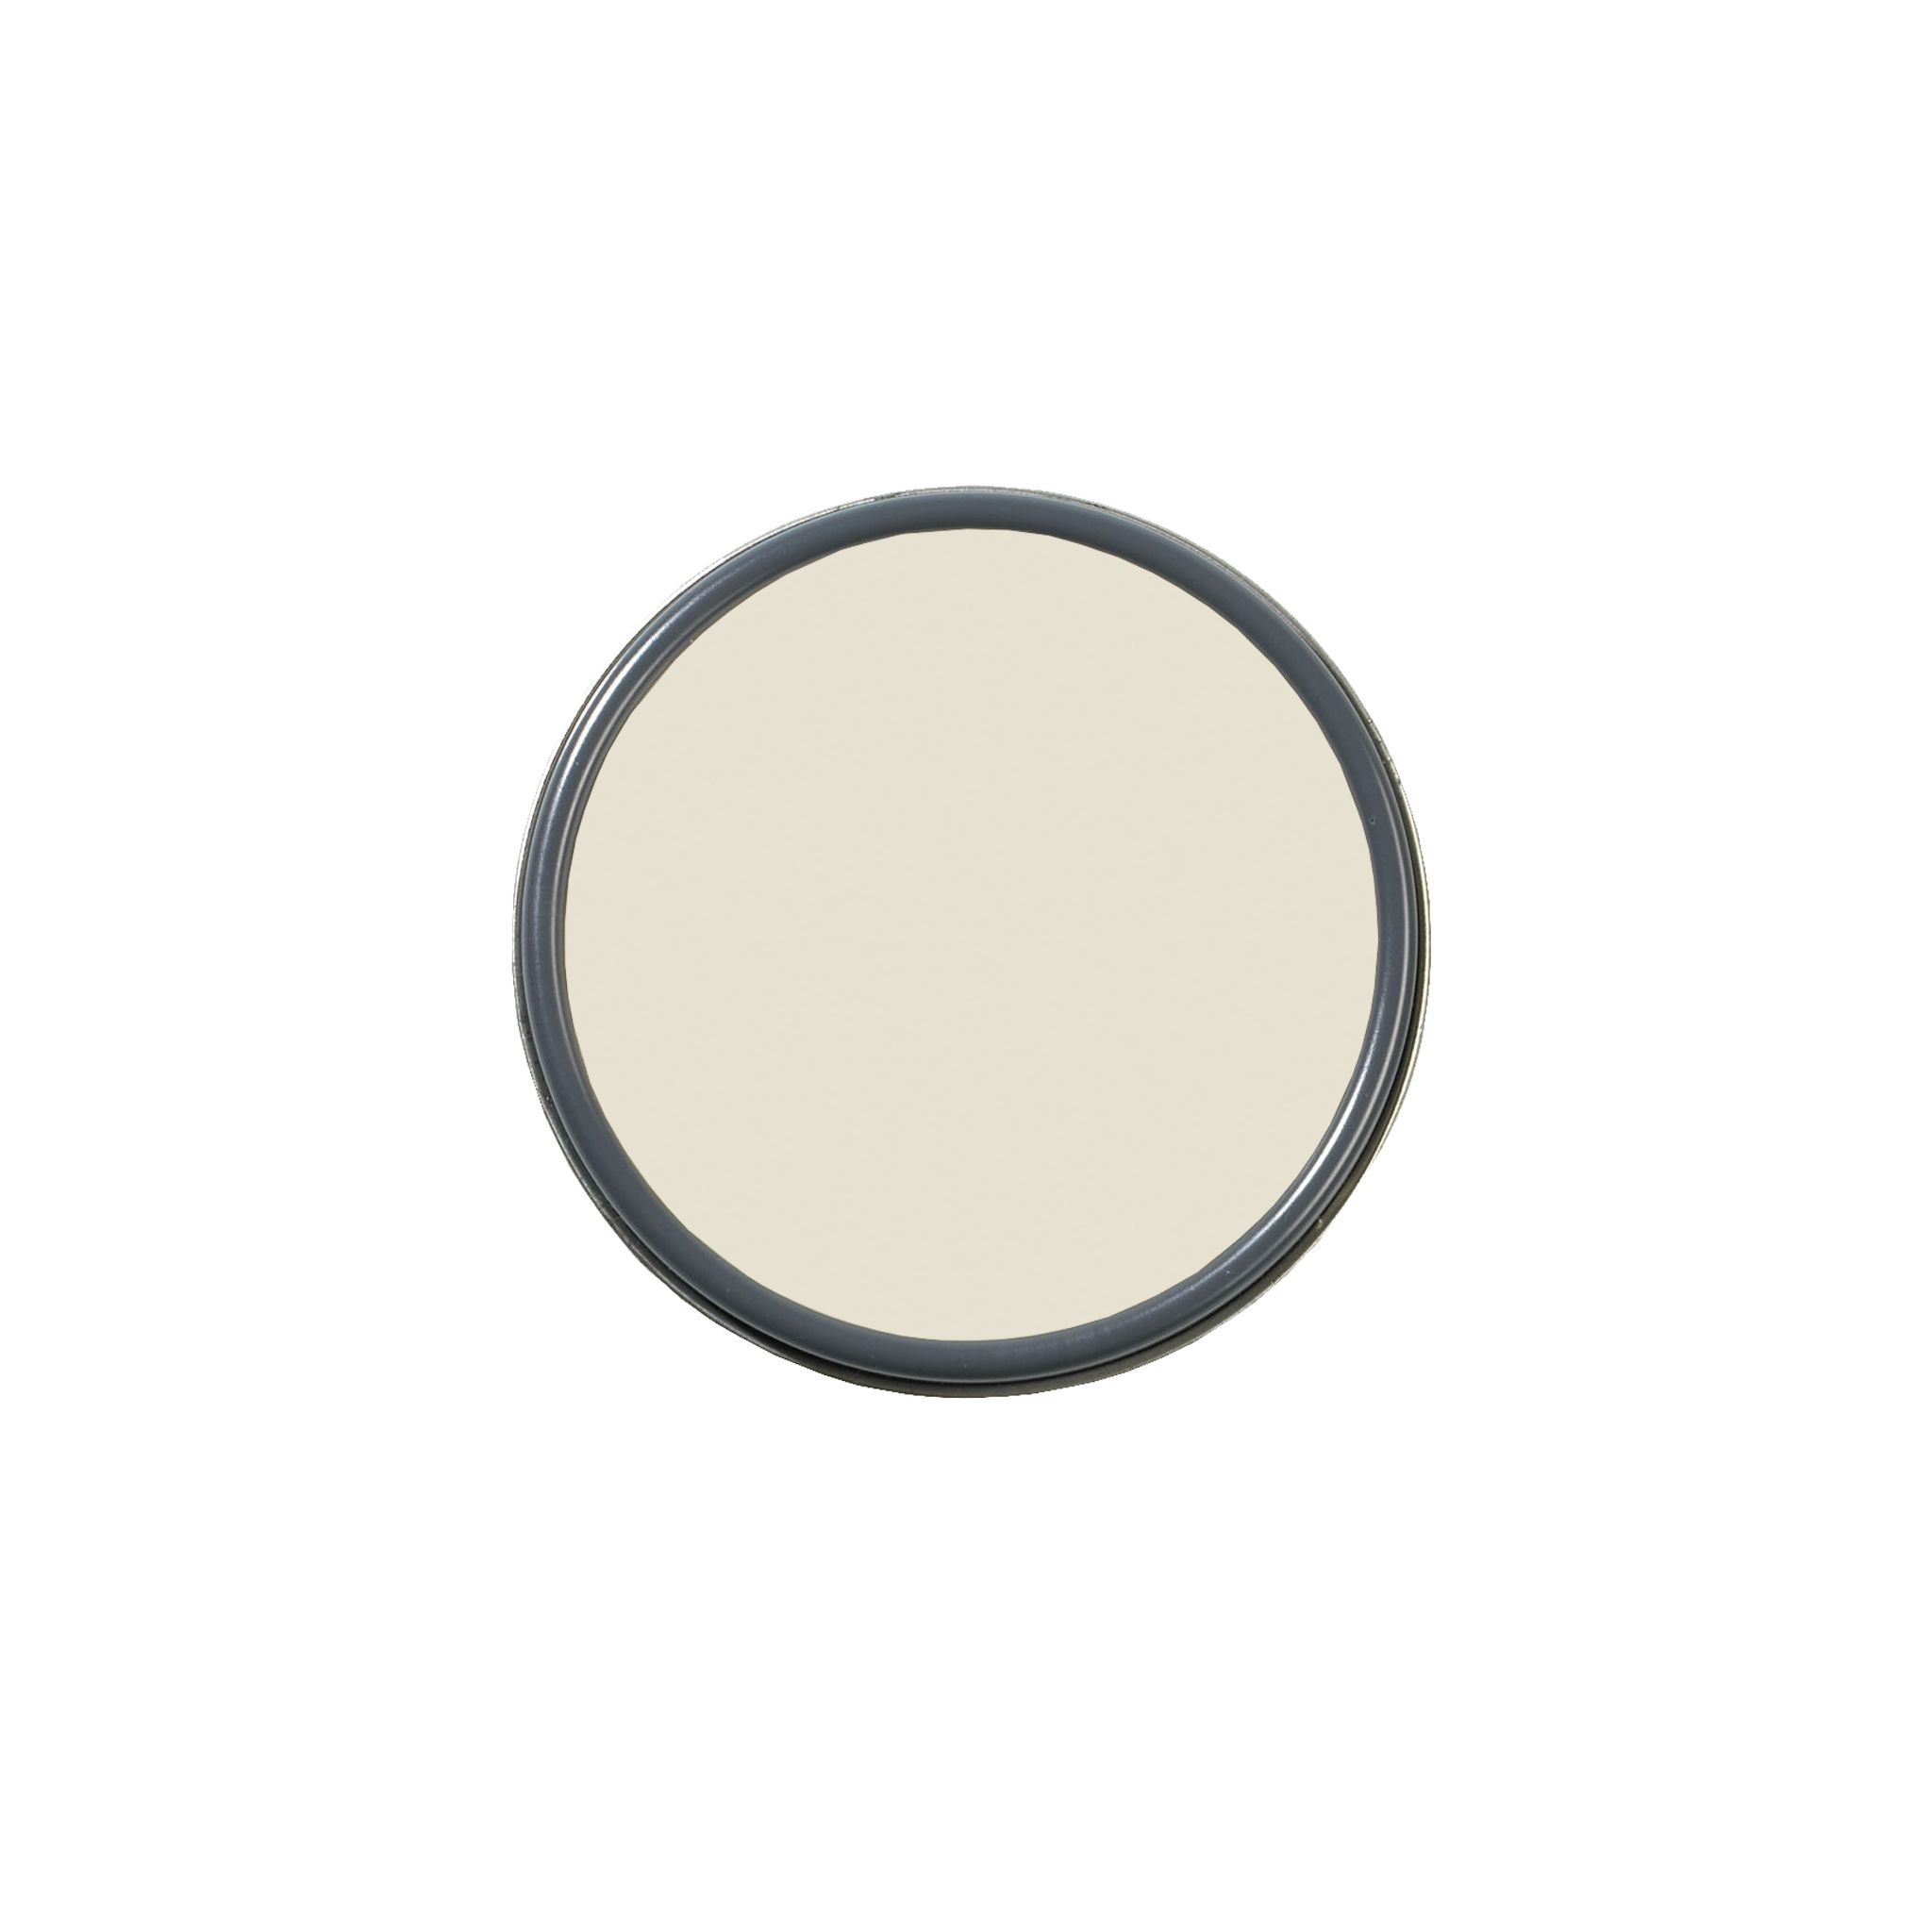 ballet white paint